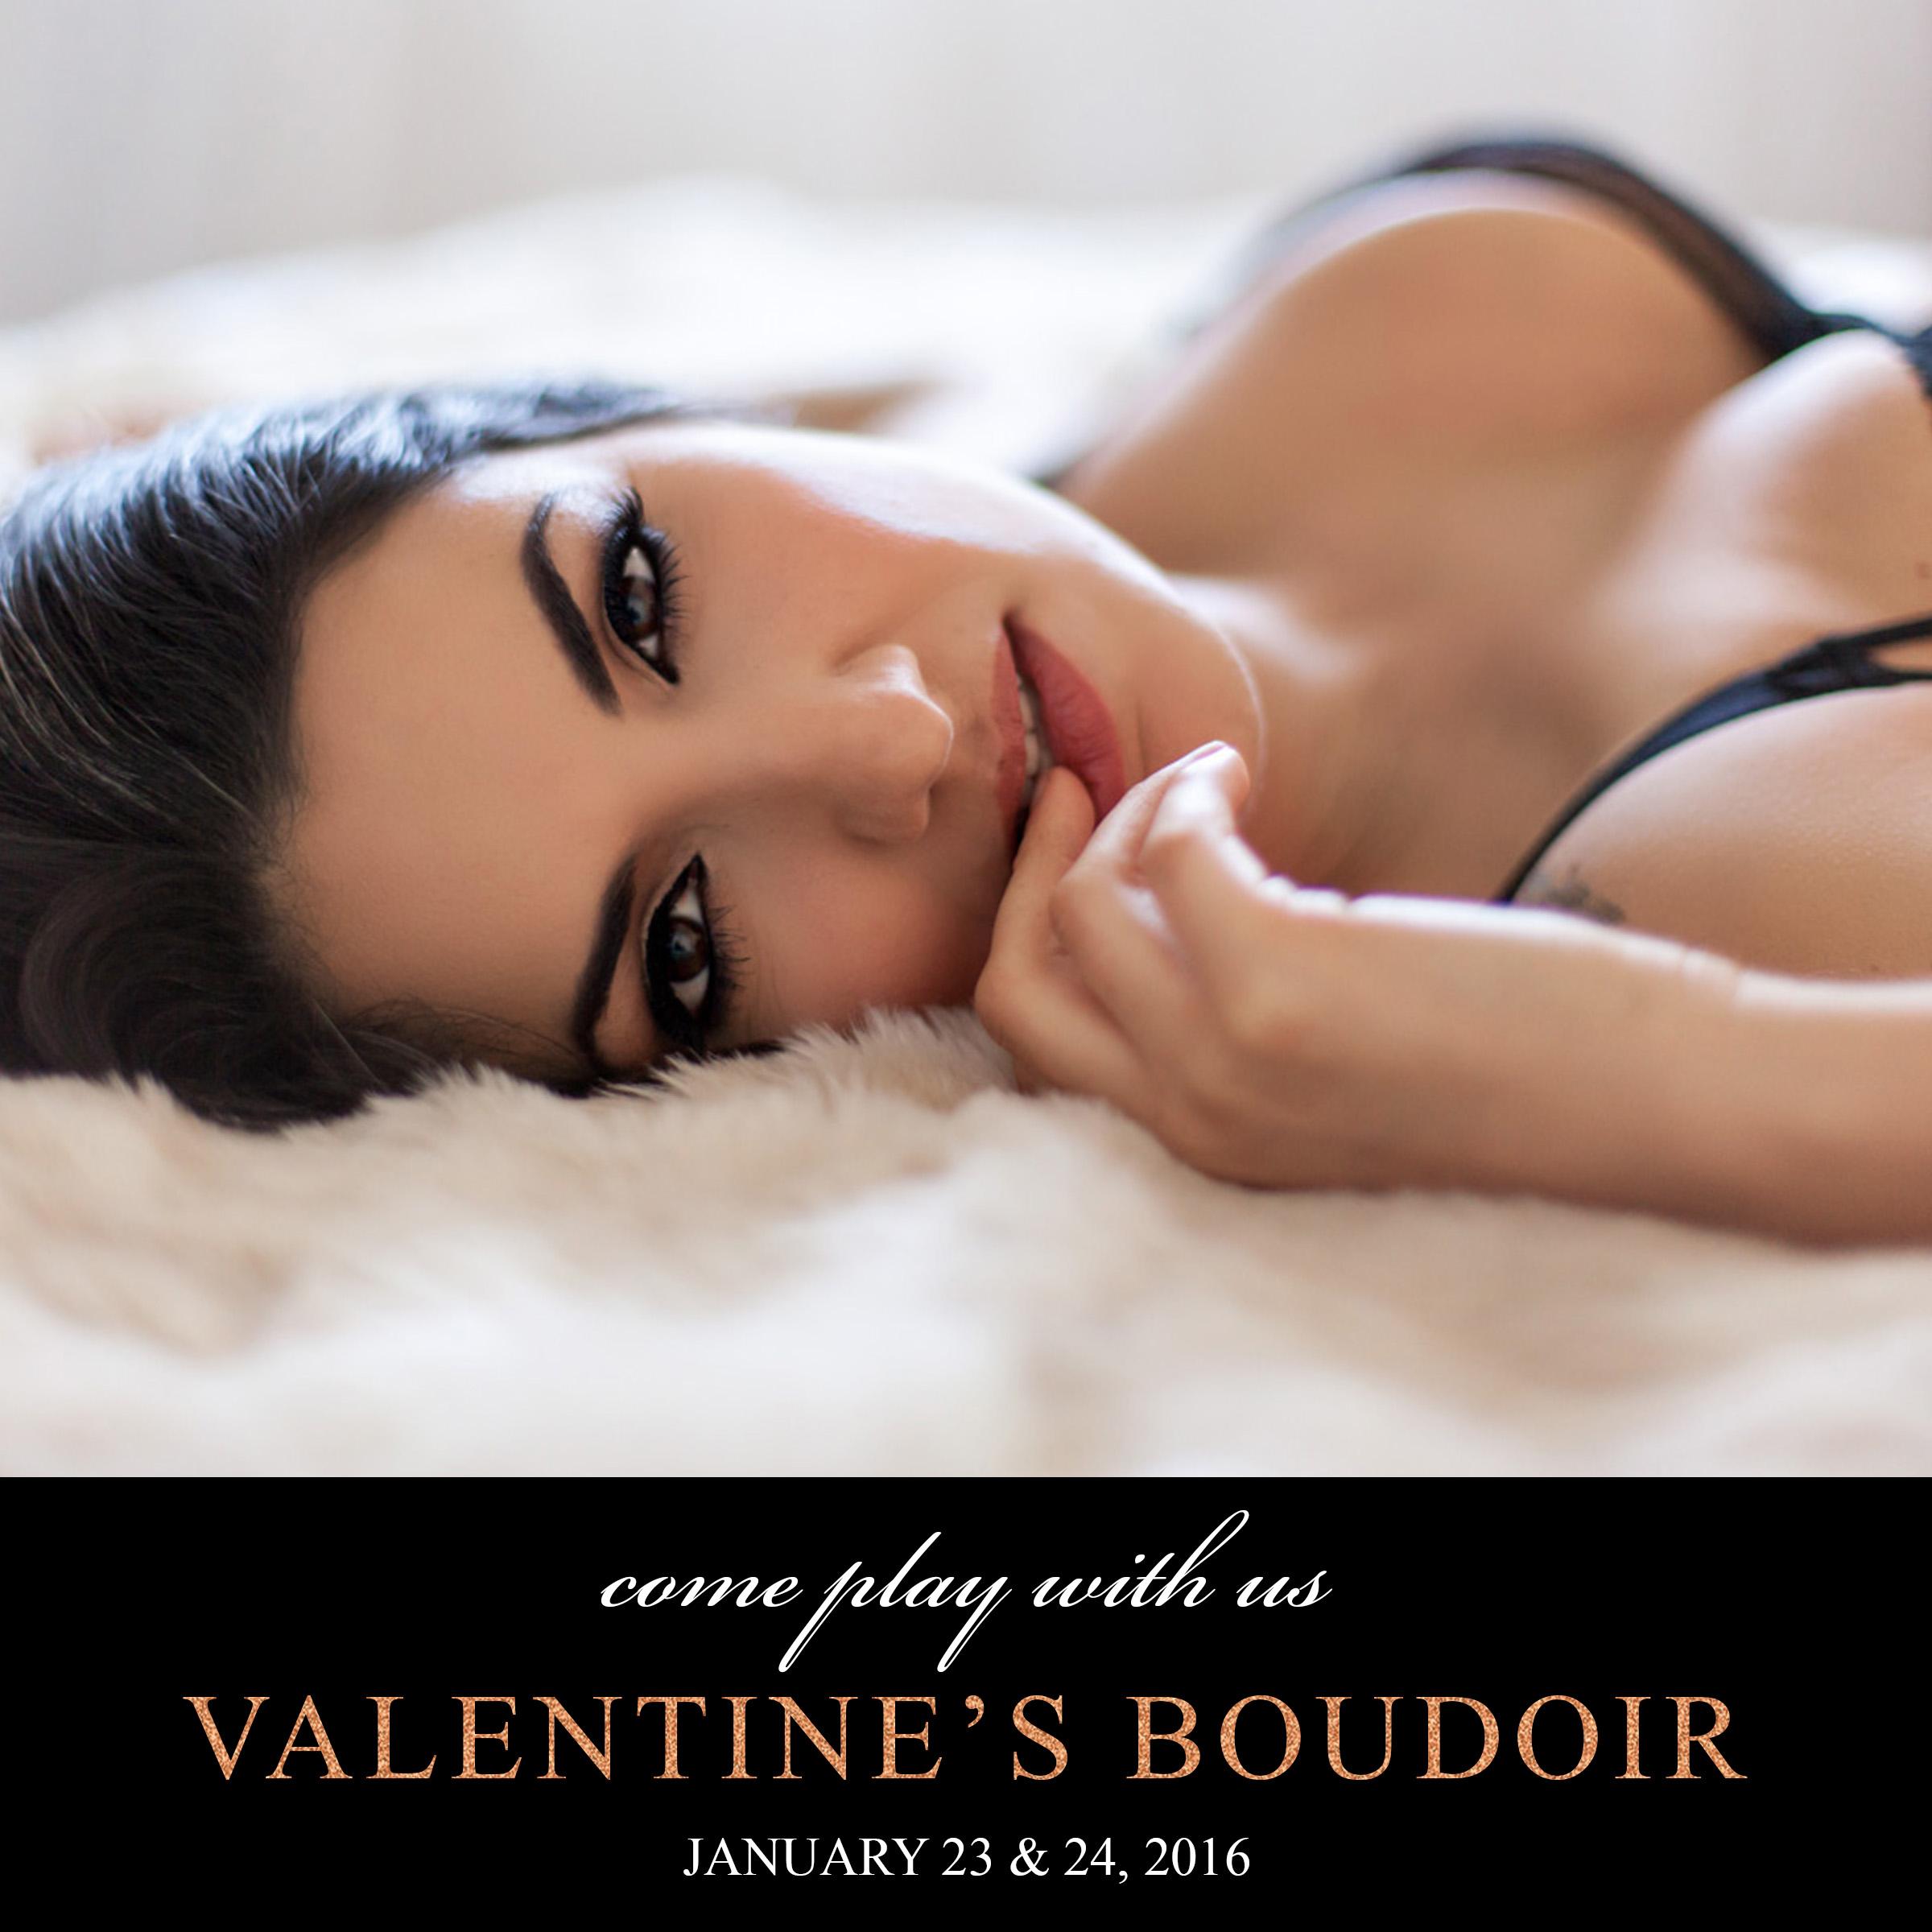 Valentine's Boudoir Special by XO Maggie Boudoir - Los Angeles Boudoir Photographer